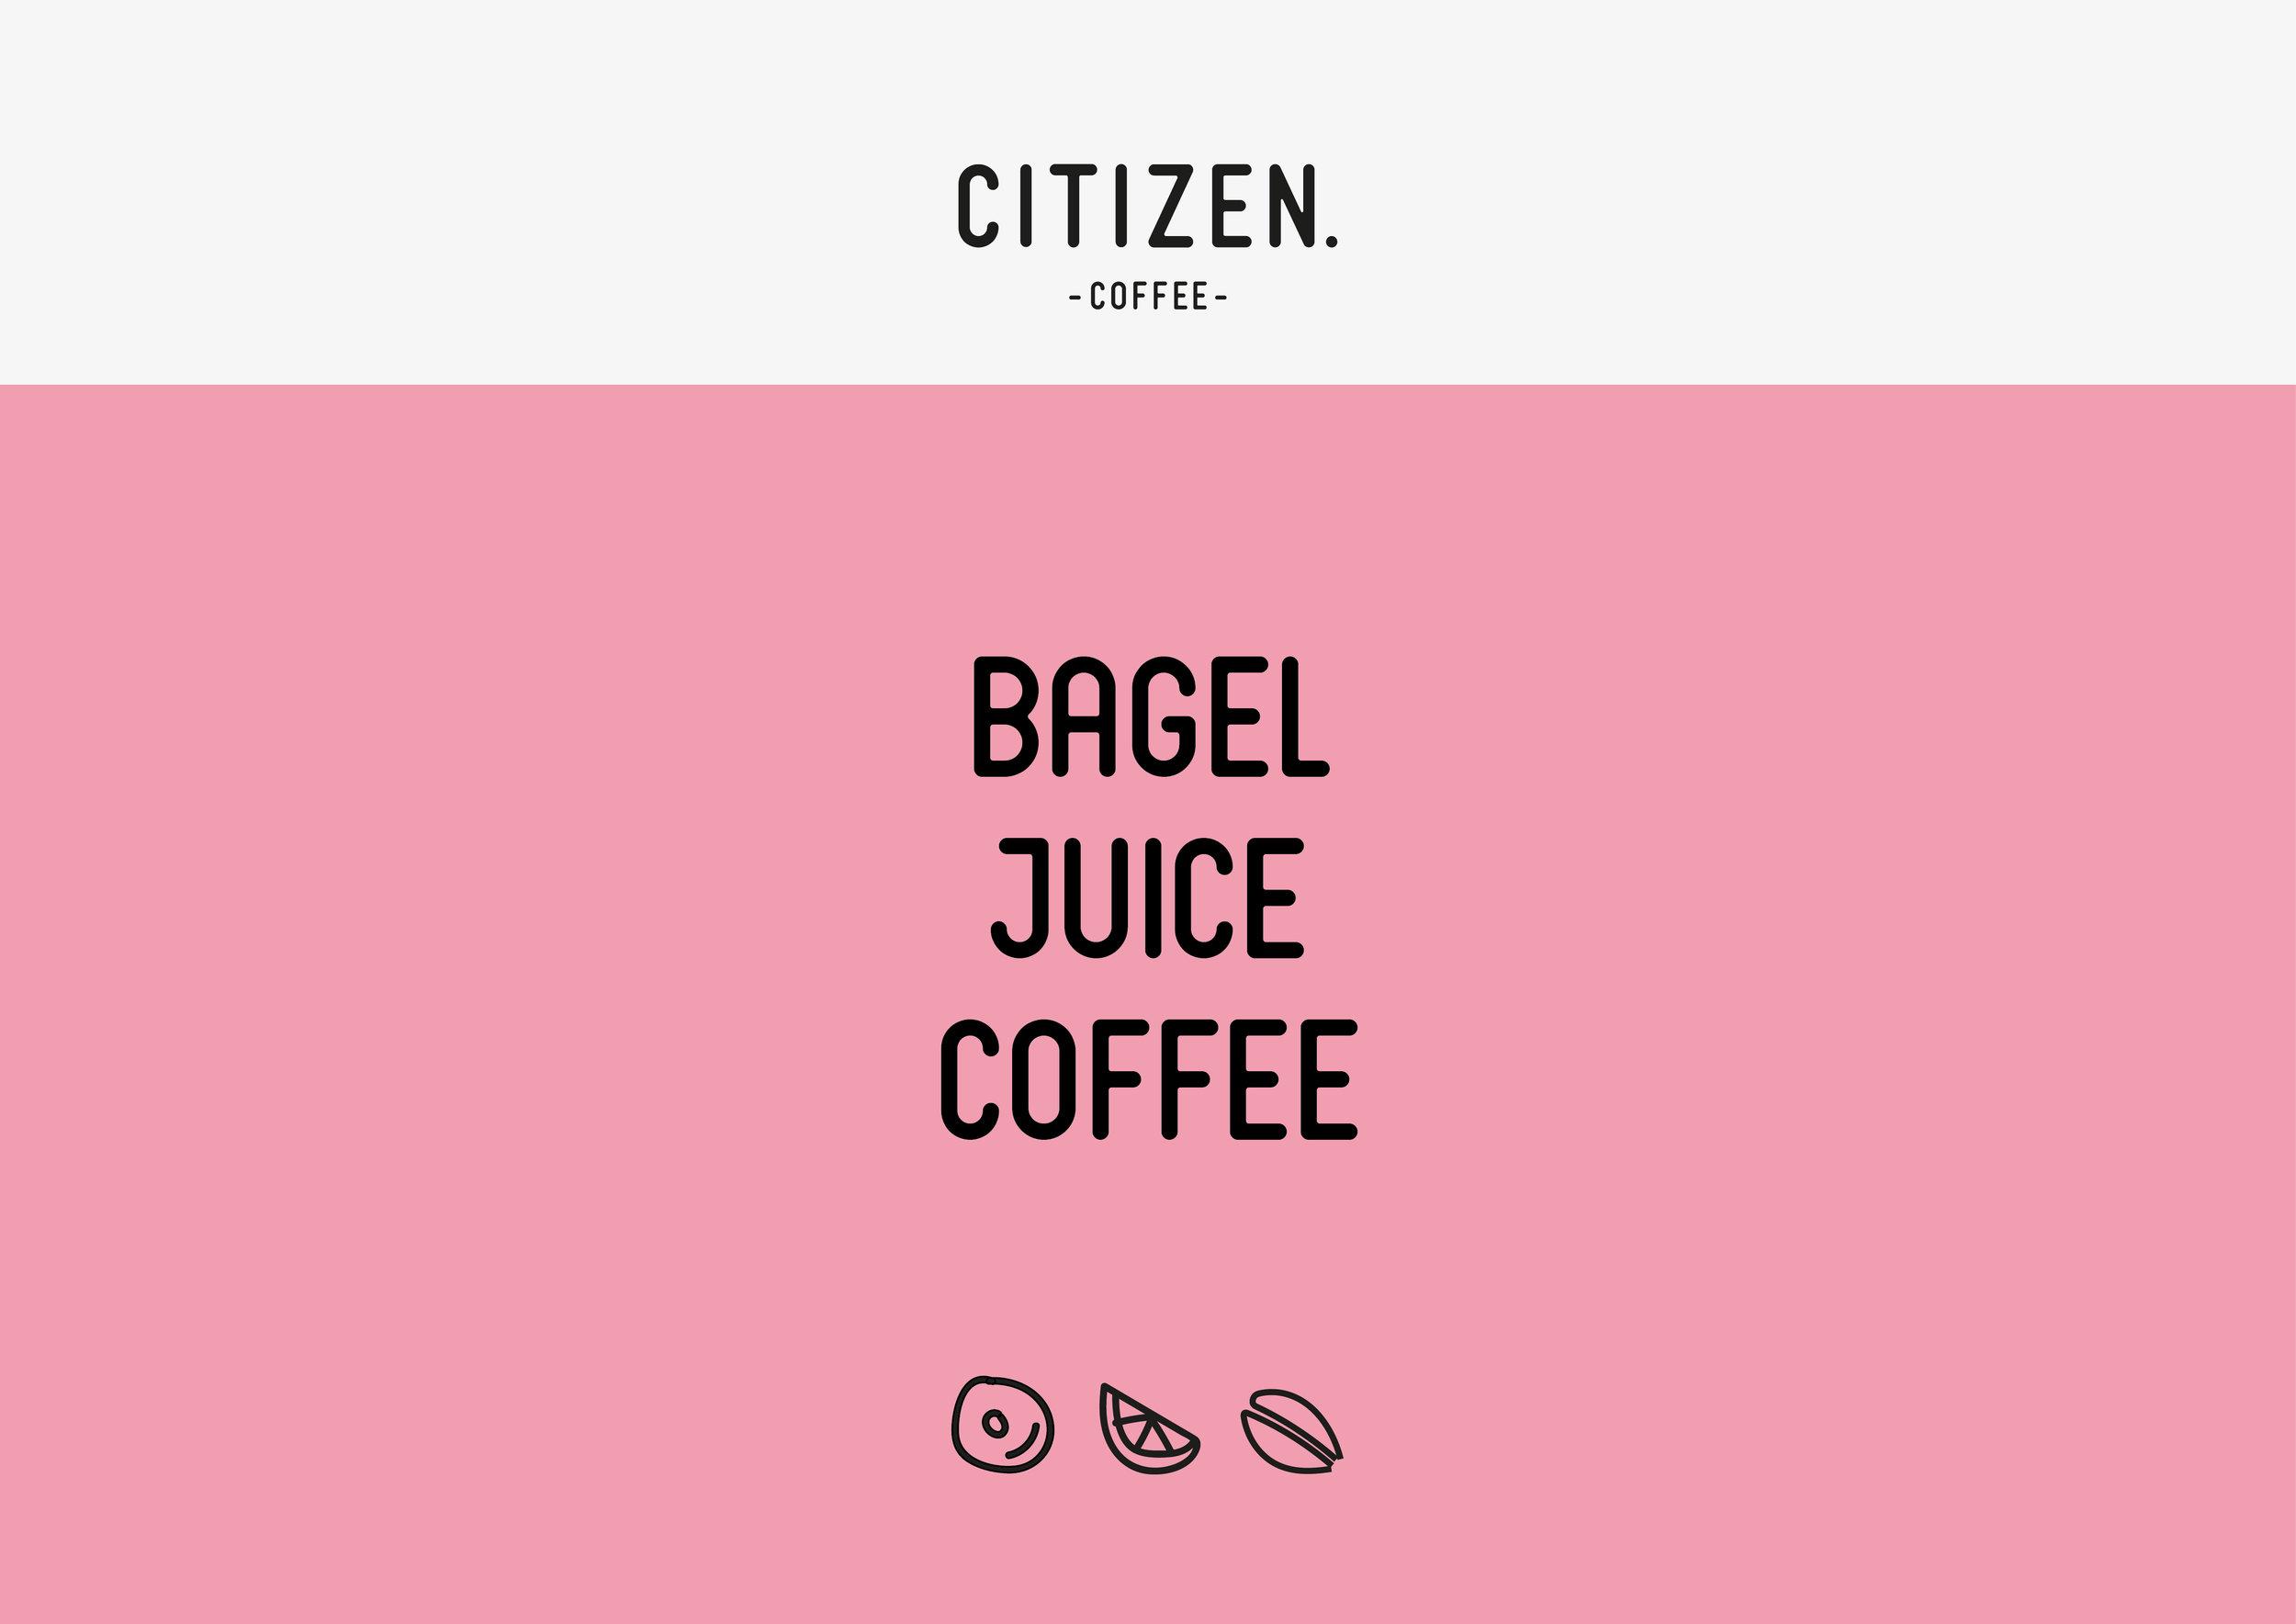 Citizen coffee menu mockup-01.jpg